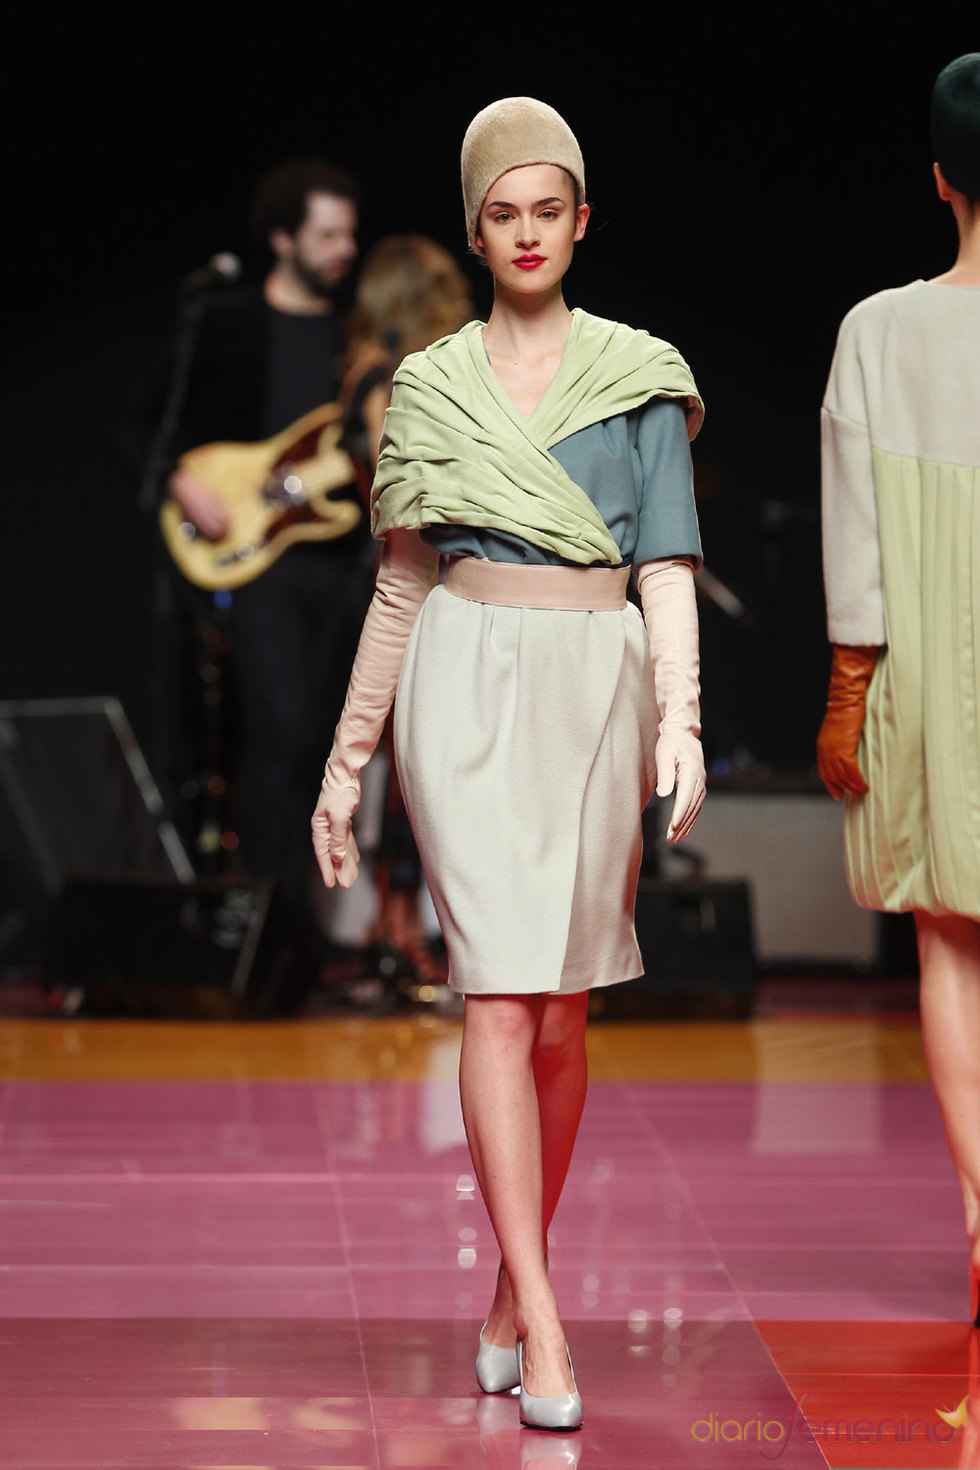 Moda Mujer Duyos 2010-11